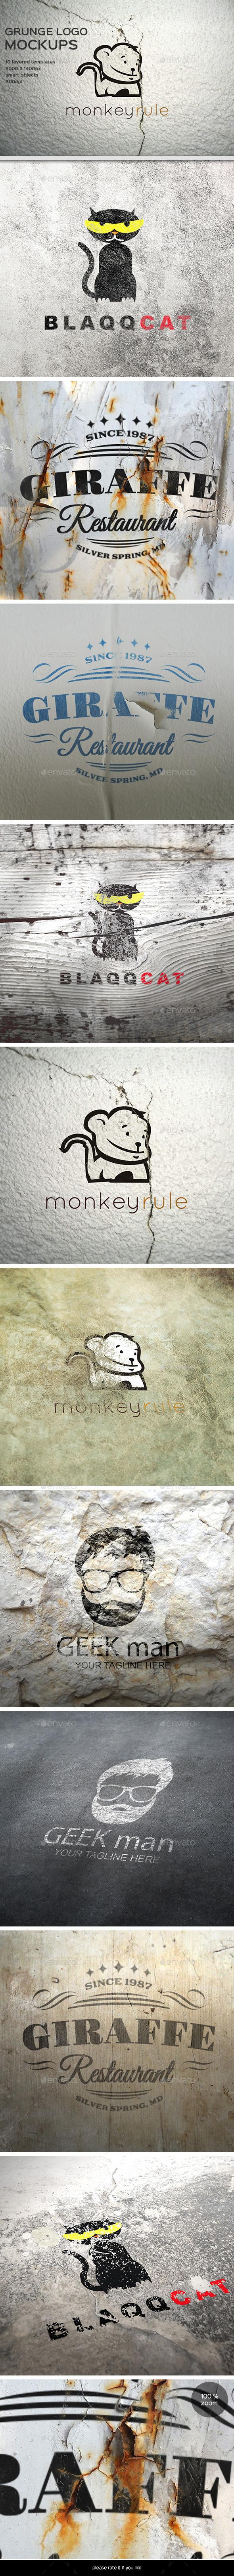 GraphicRiver Grunge Logo Mockup 8897209